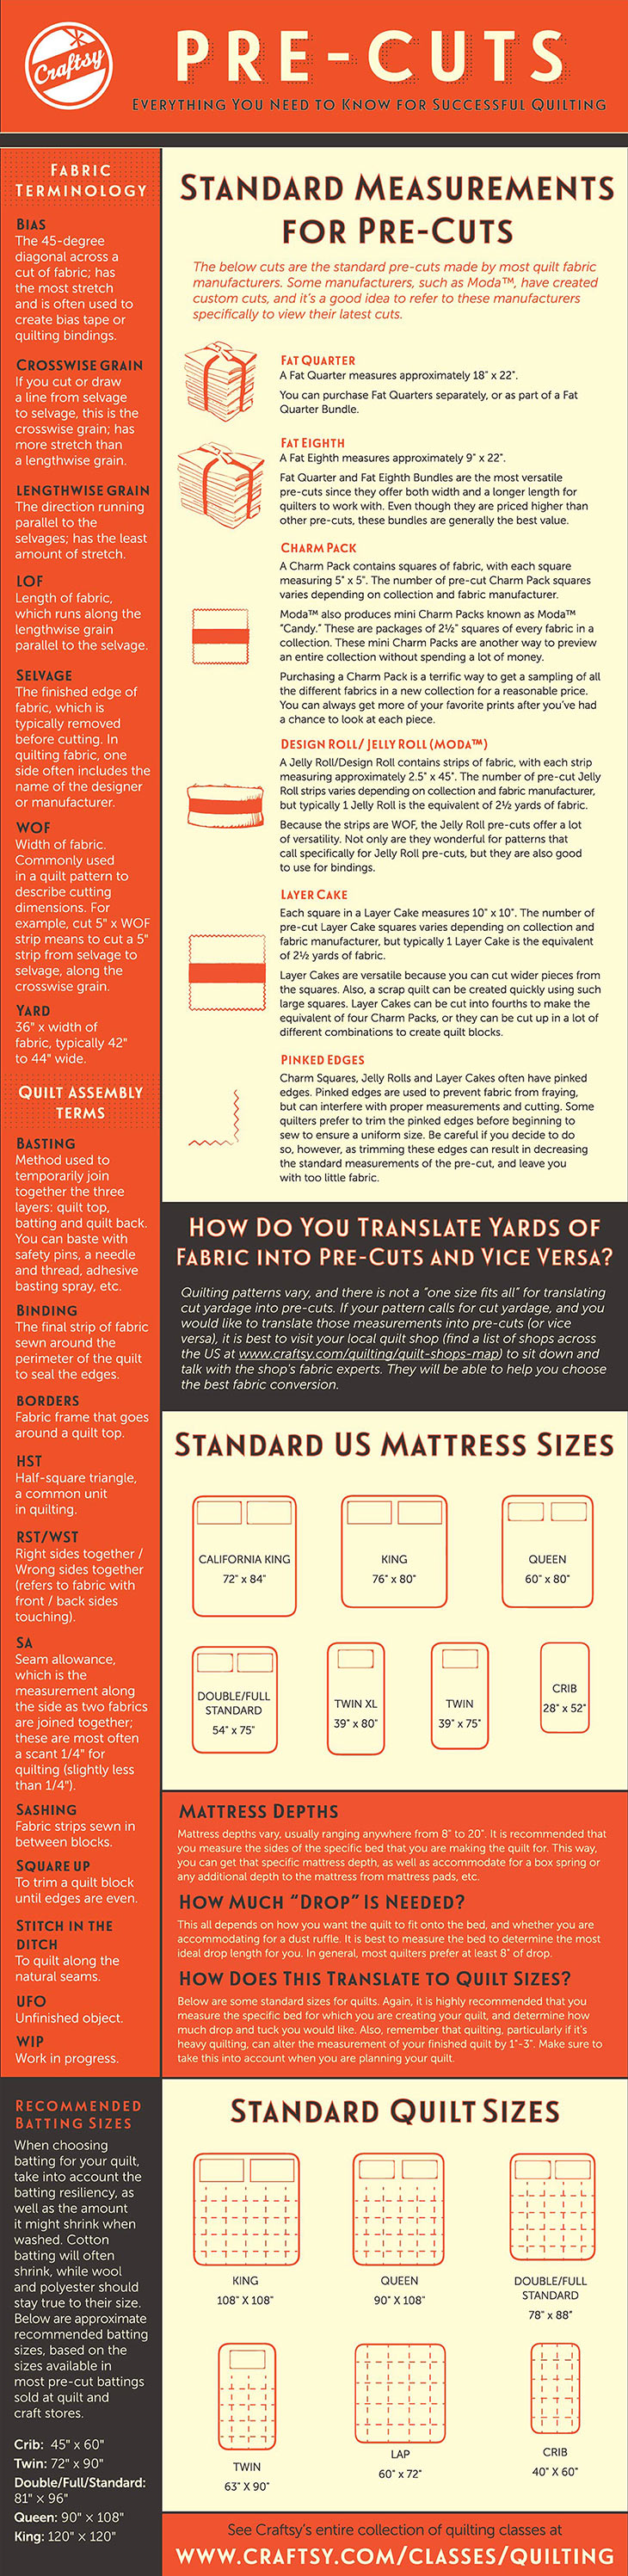 Bluprint Pre-Cut Infographic